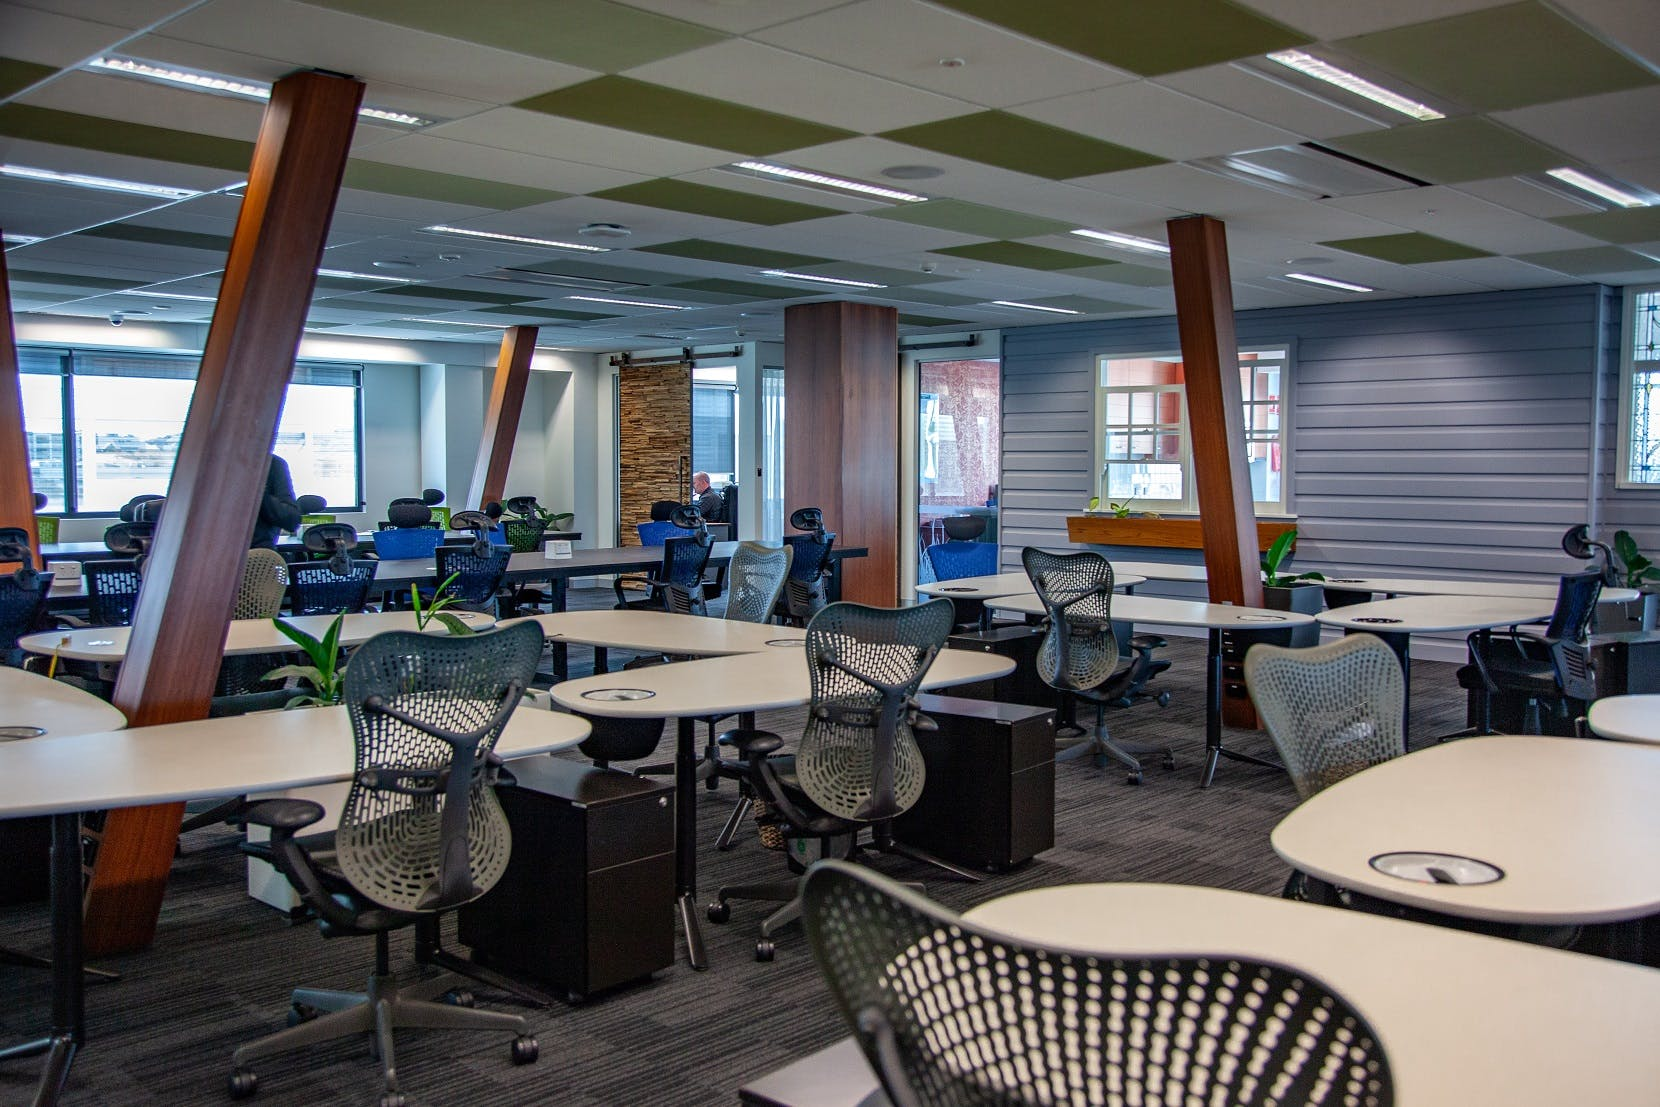 Hot desk at Officenexus, image 2